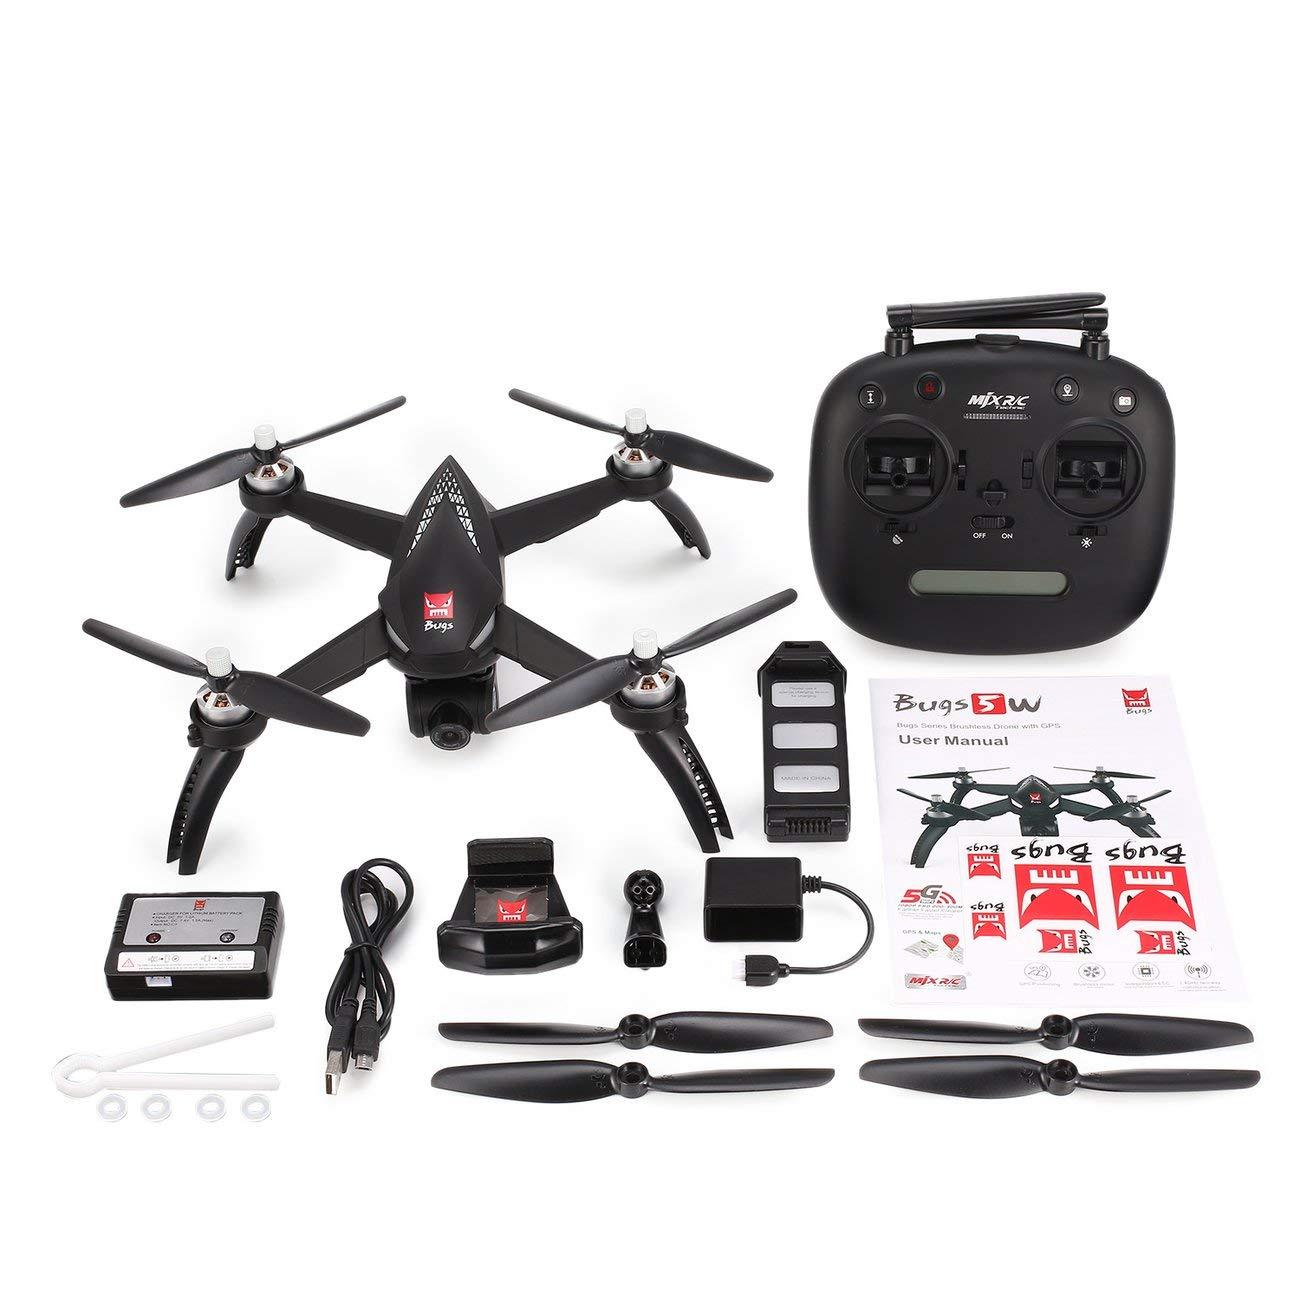 Fannty Für MJX Bugs 5 Watt B5 Watt Brushless Motor GPS FPV RC Drone Quadcopter mit Einstellbarer 5G WiFi 1080 P Kamera Follow Me Hovering